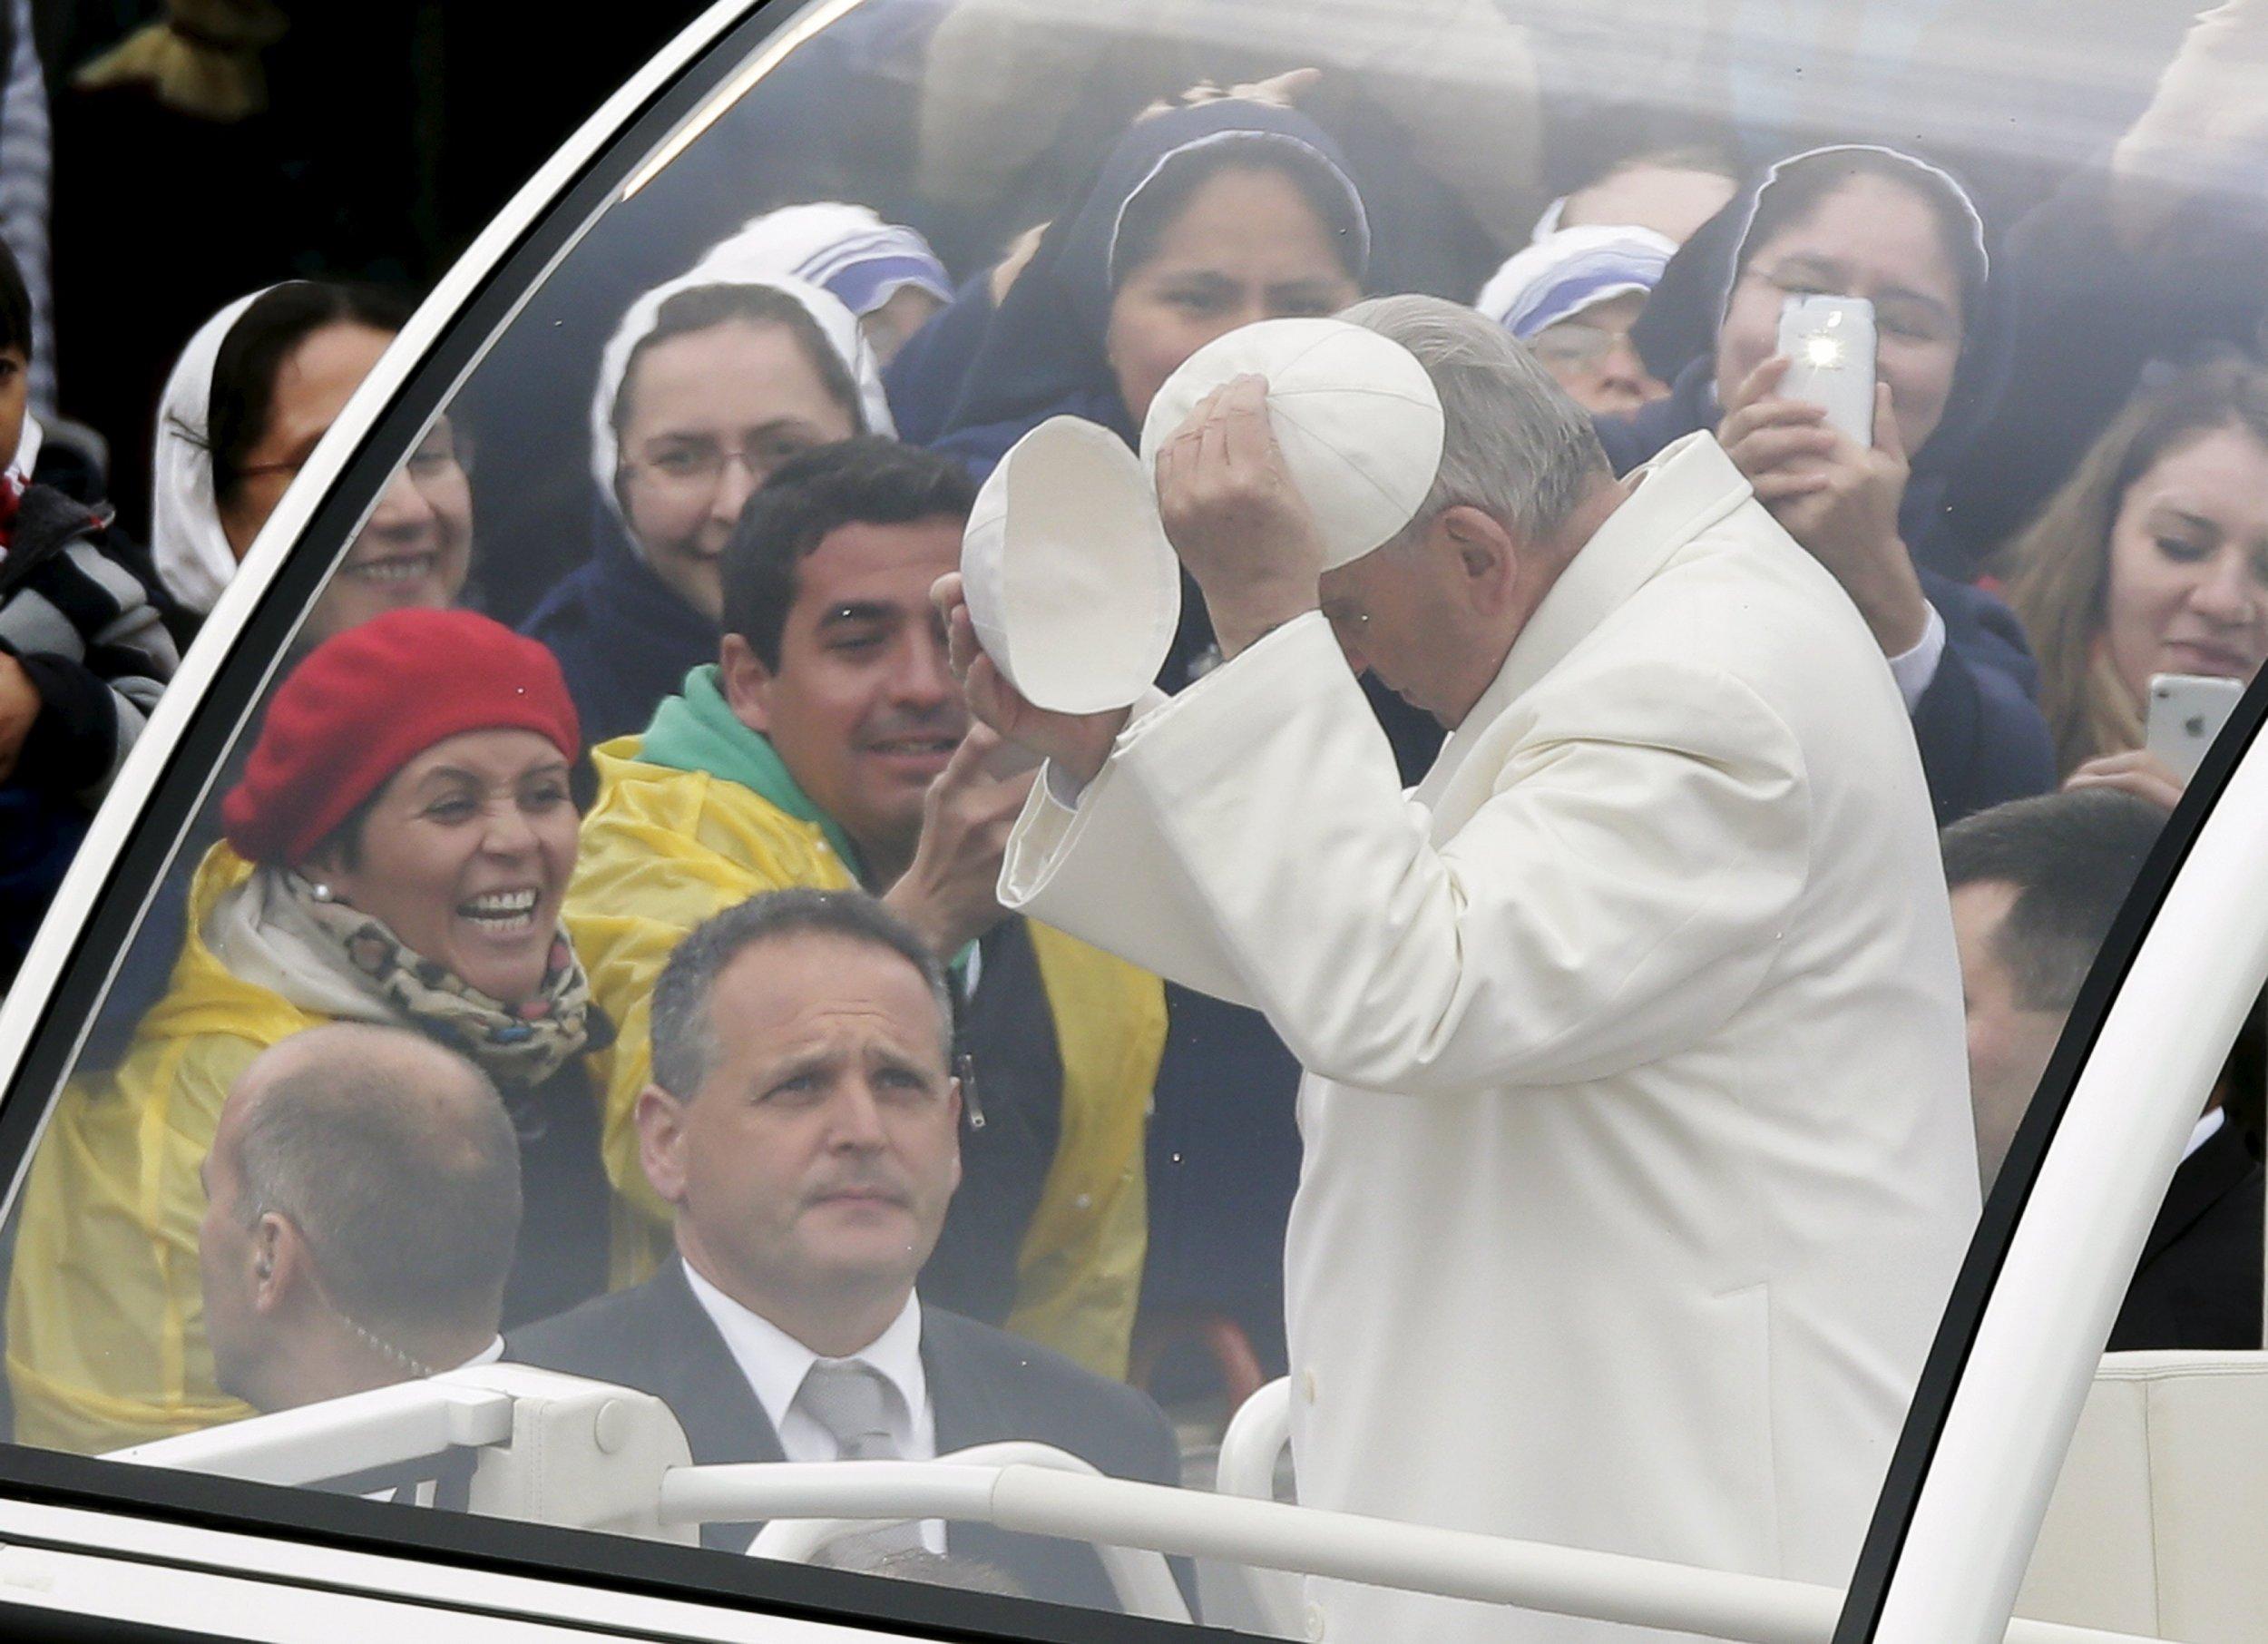 2015-04-05T192237Z_2_LYNXMPEB3403K_RTROPTP_4_RELIGION-EASTER-POPE